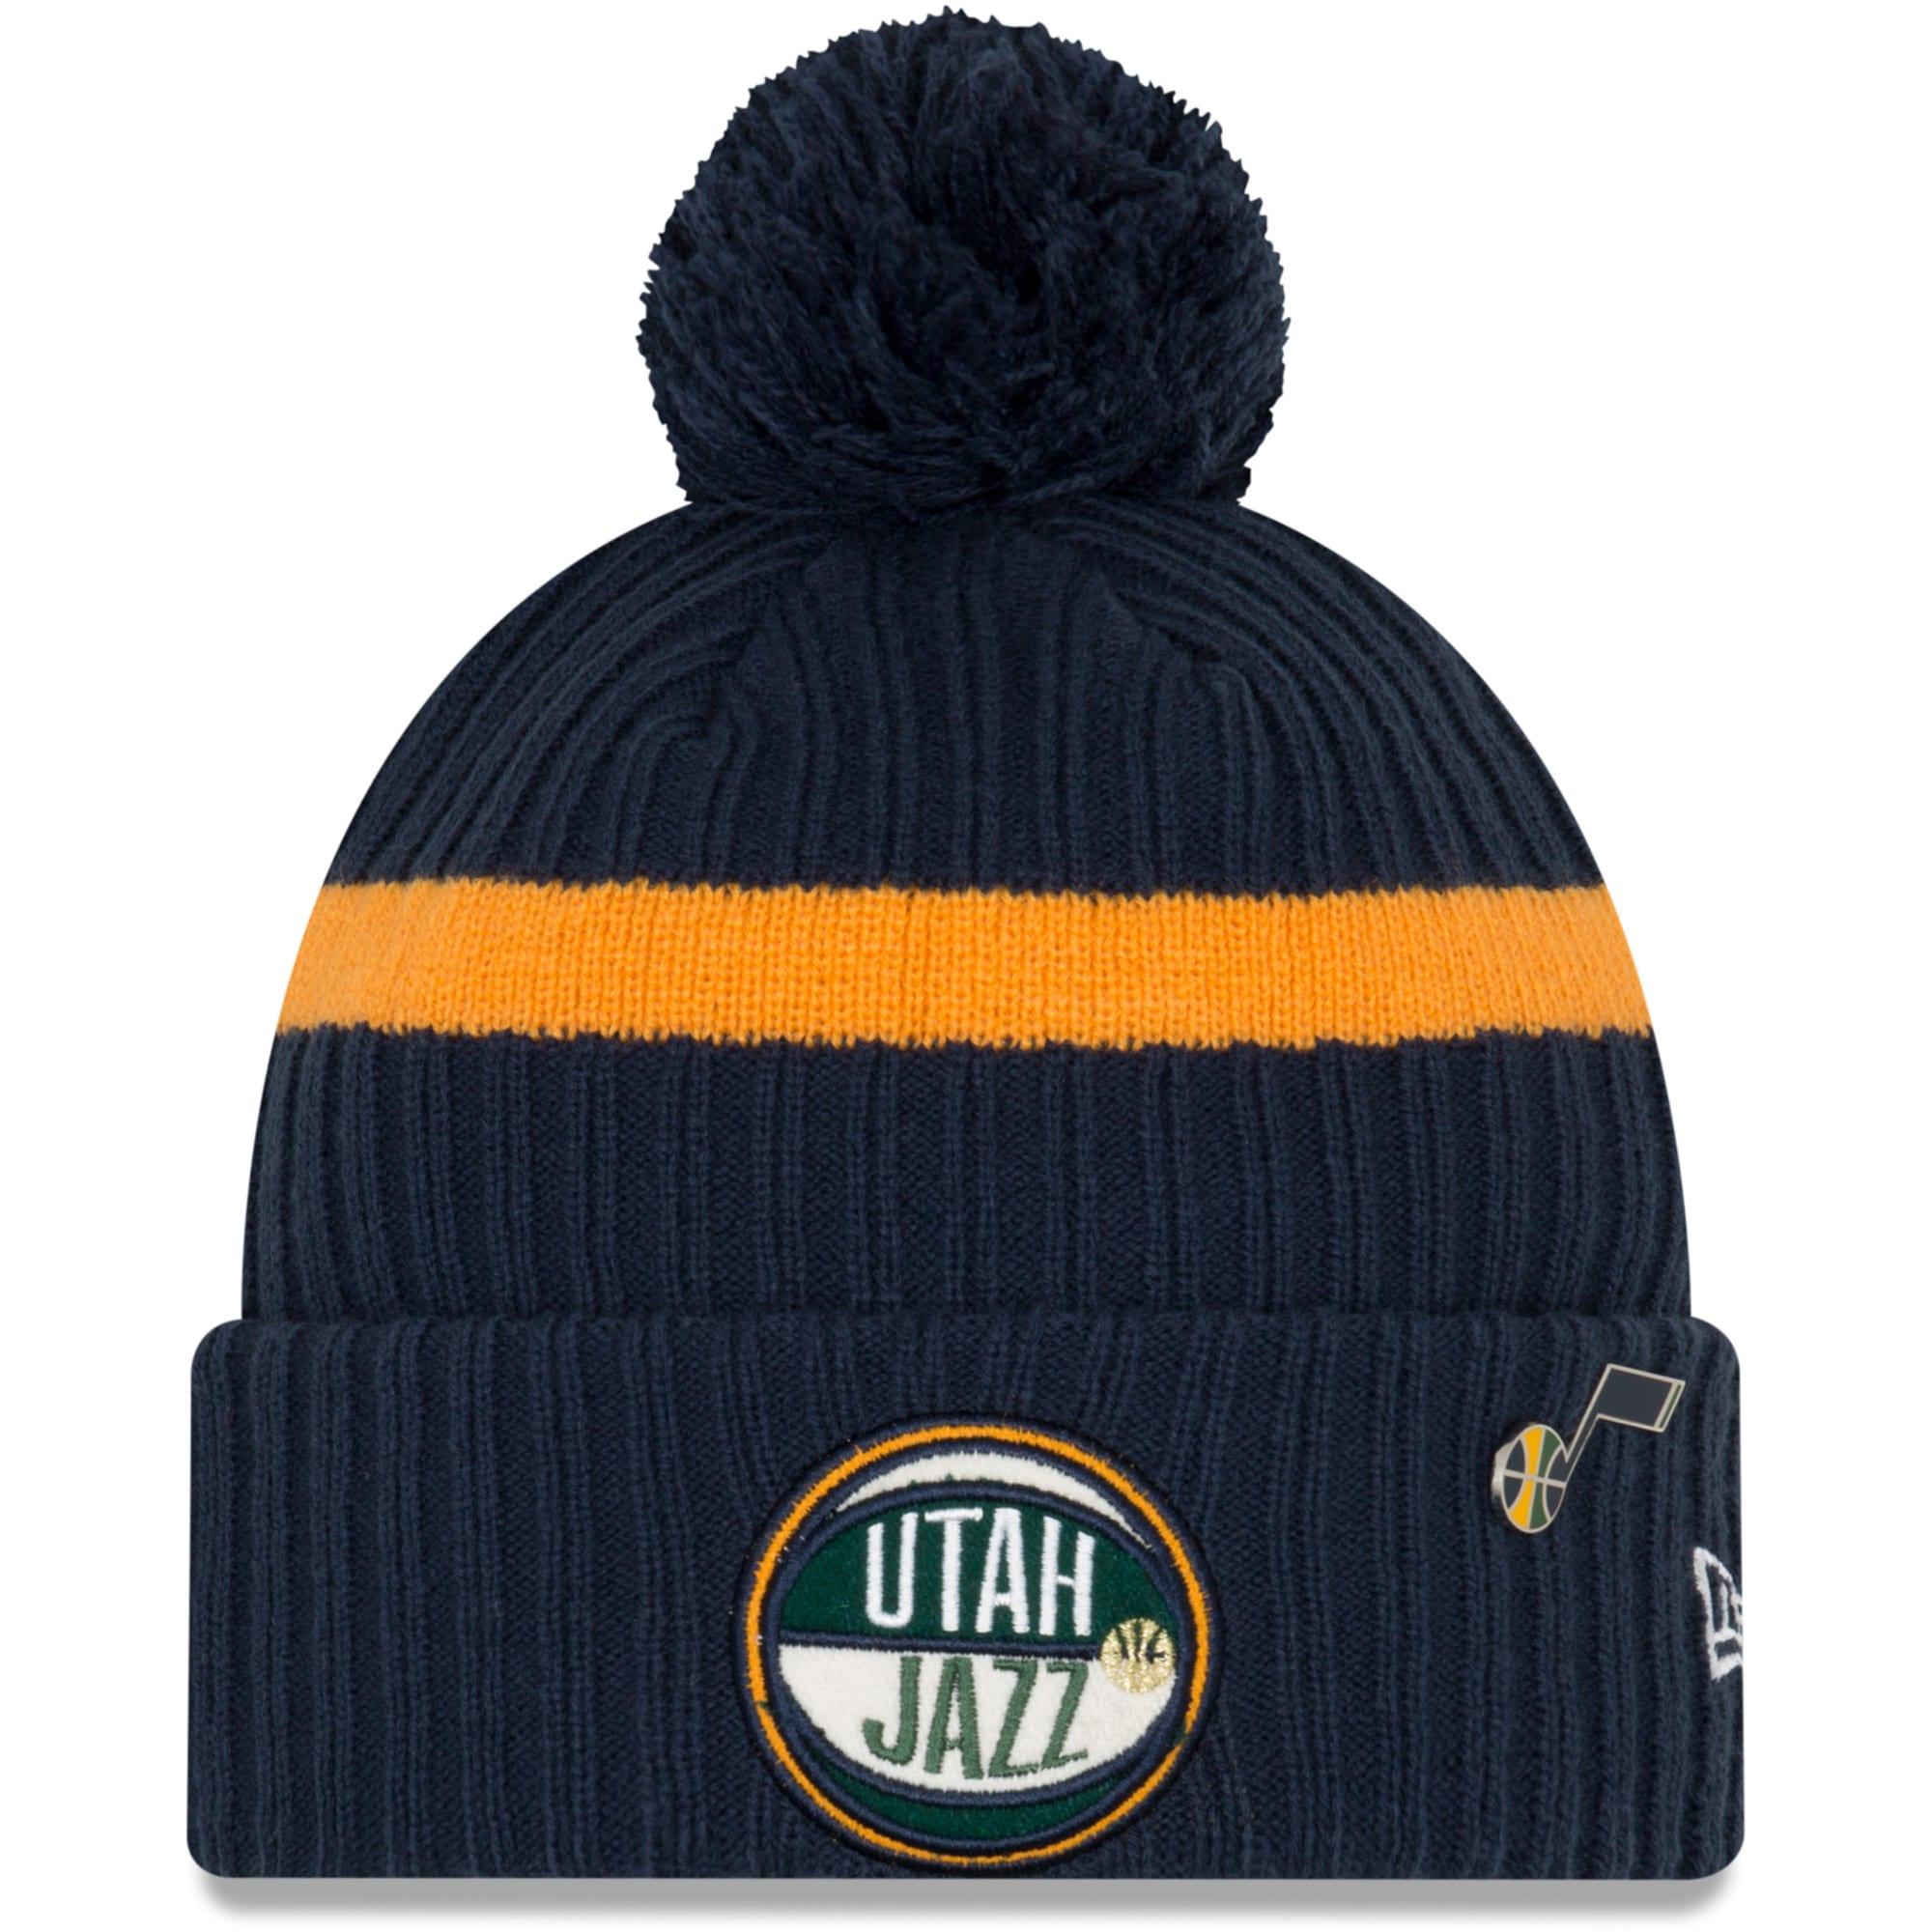 Utah Jazz New Era Youth 2019 NBA Draft Cuffed Knit Hat - Navy